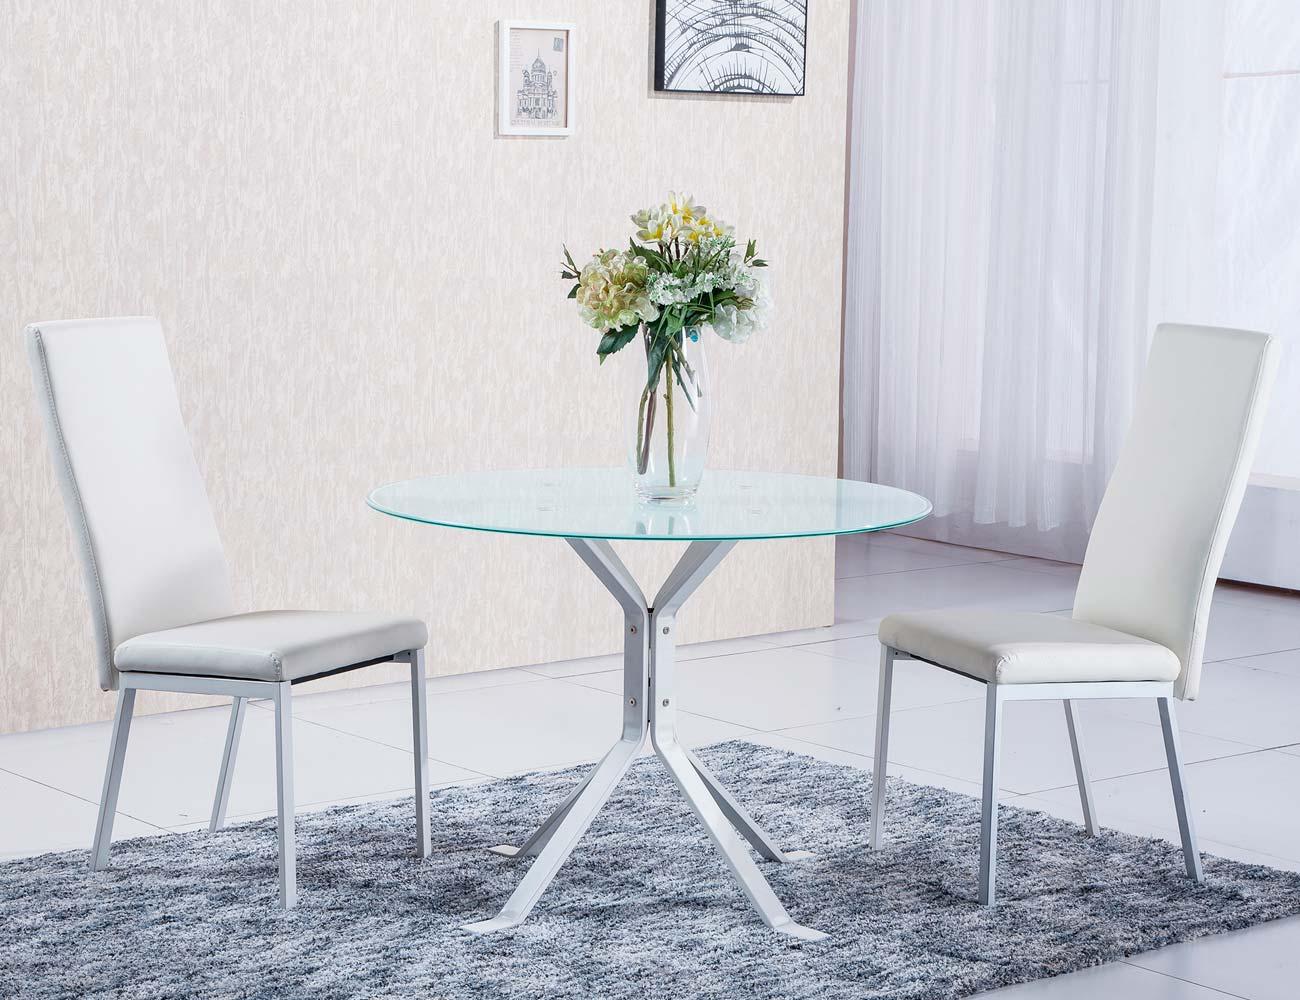 Mesa comedor redonda cristal templado patas blanca 2